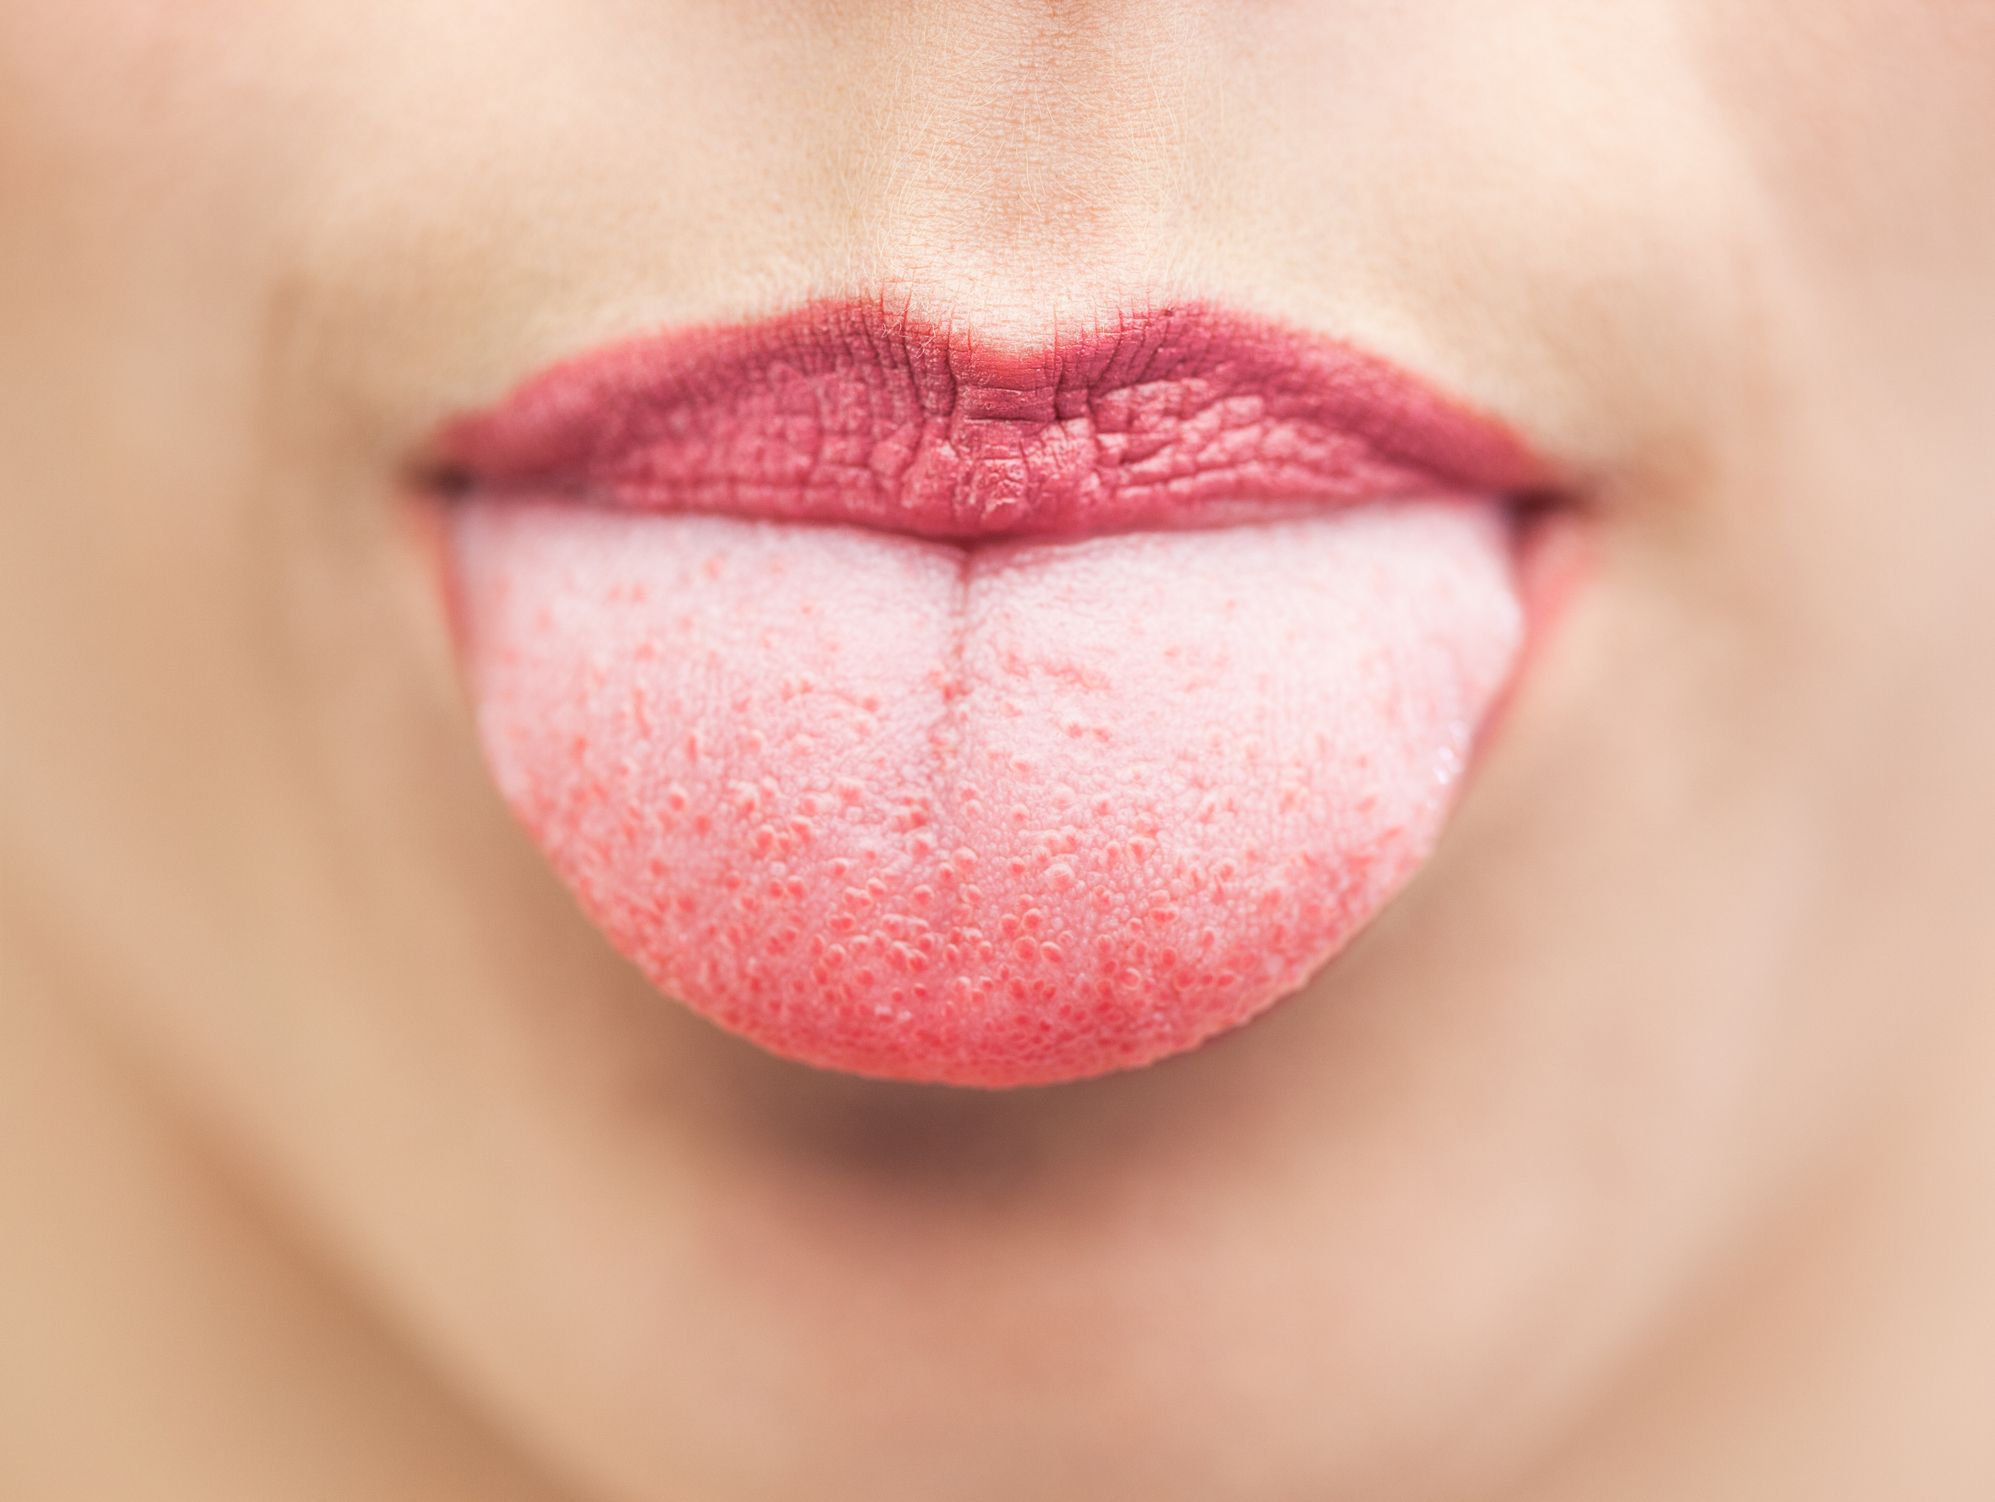 swollen papillae tongue treatment)